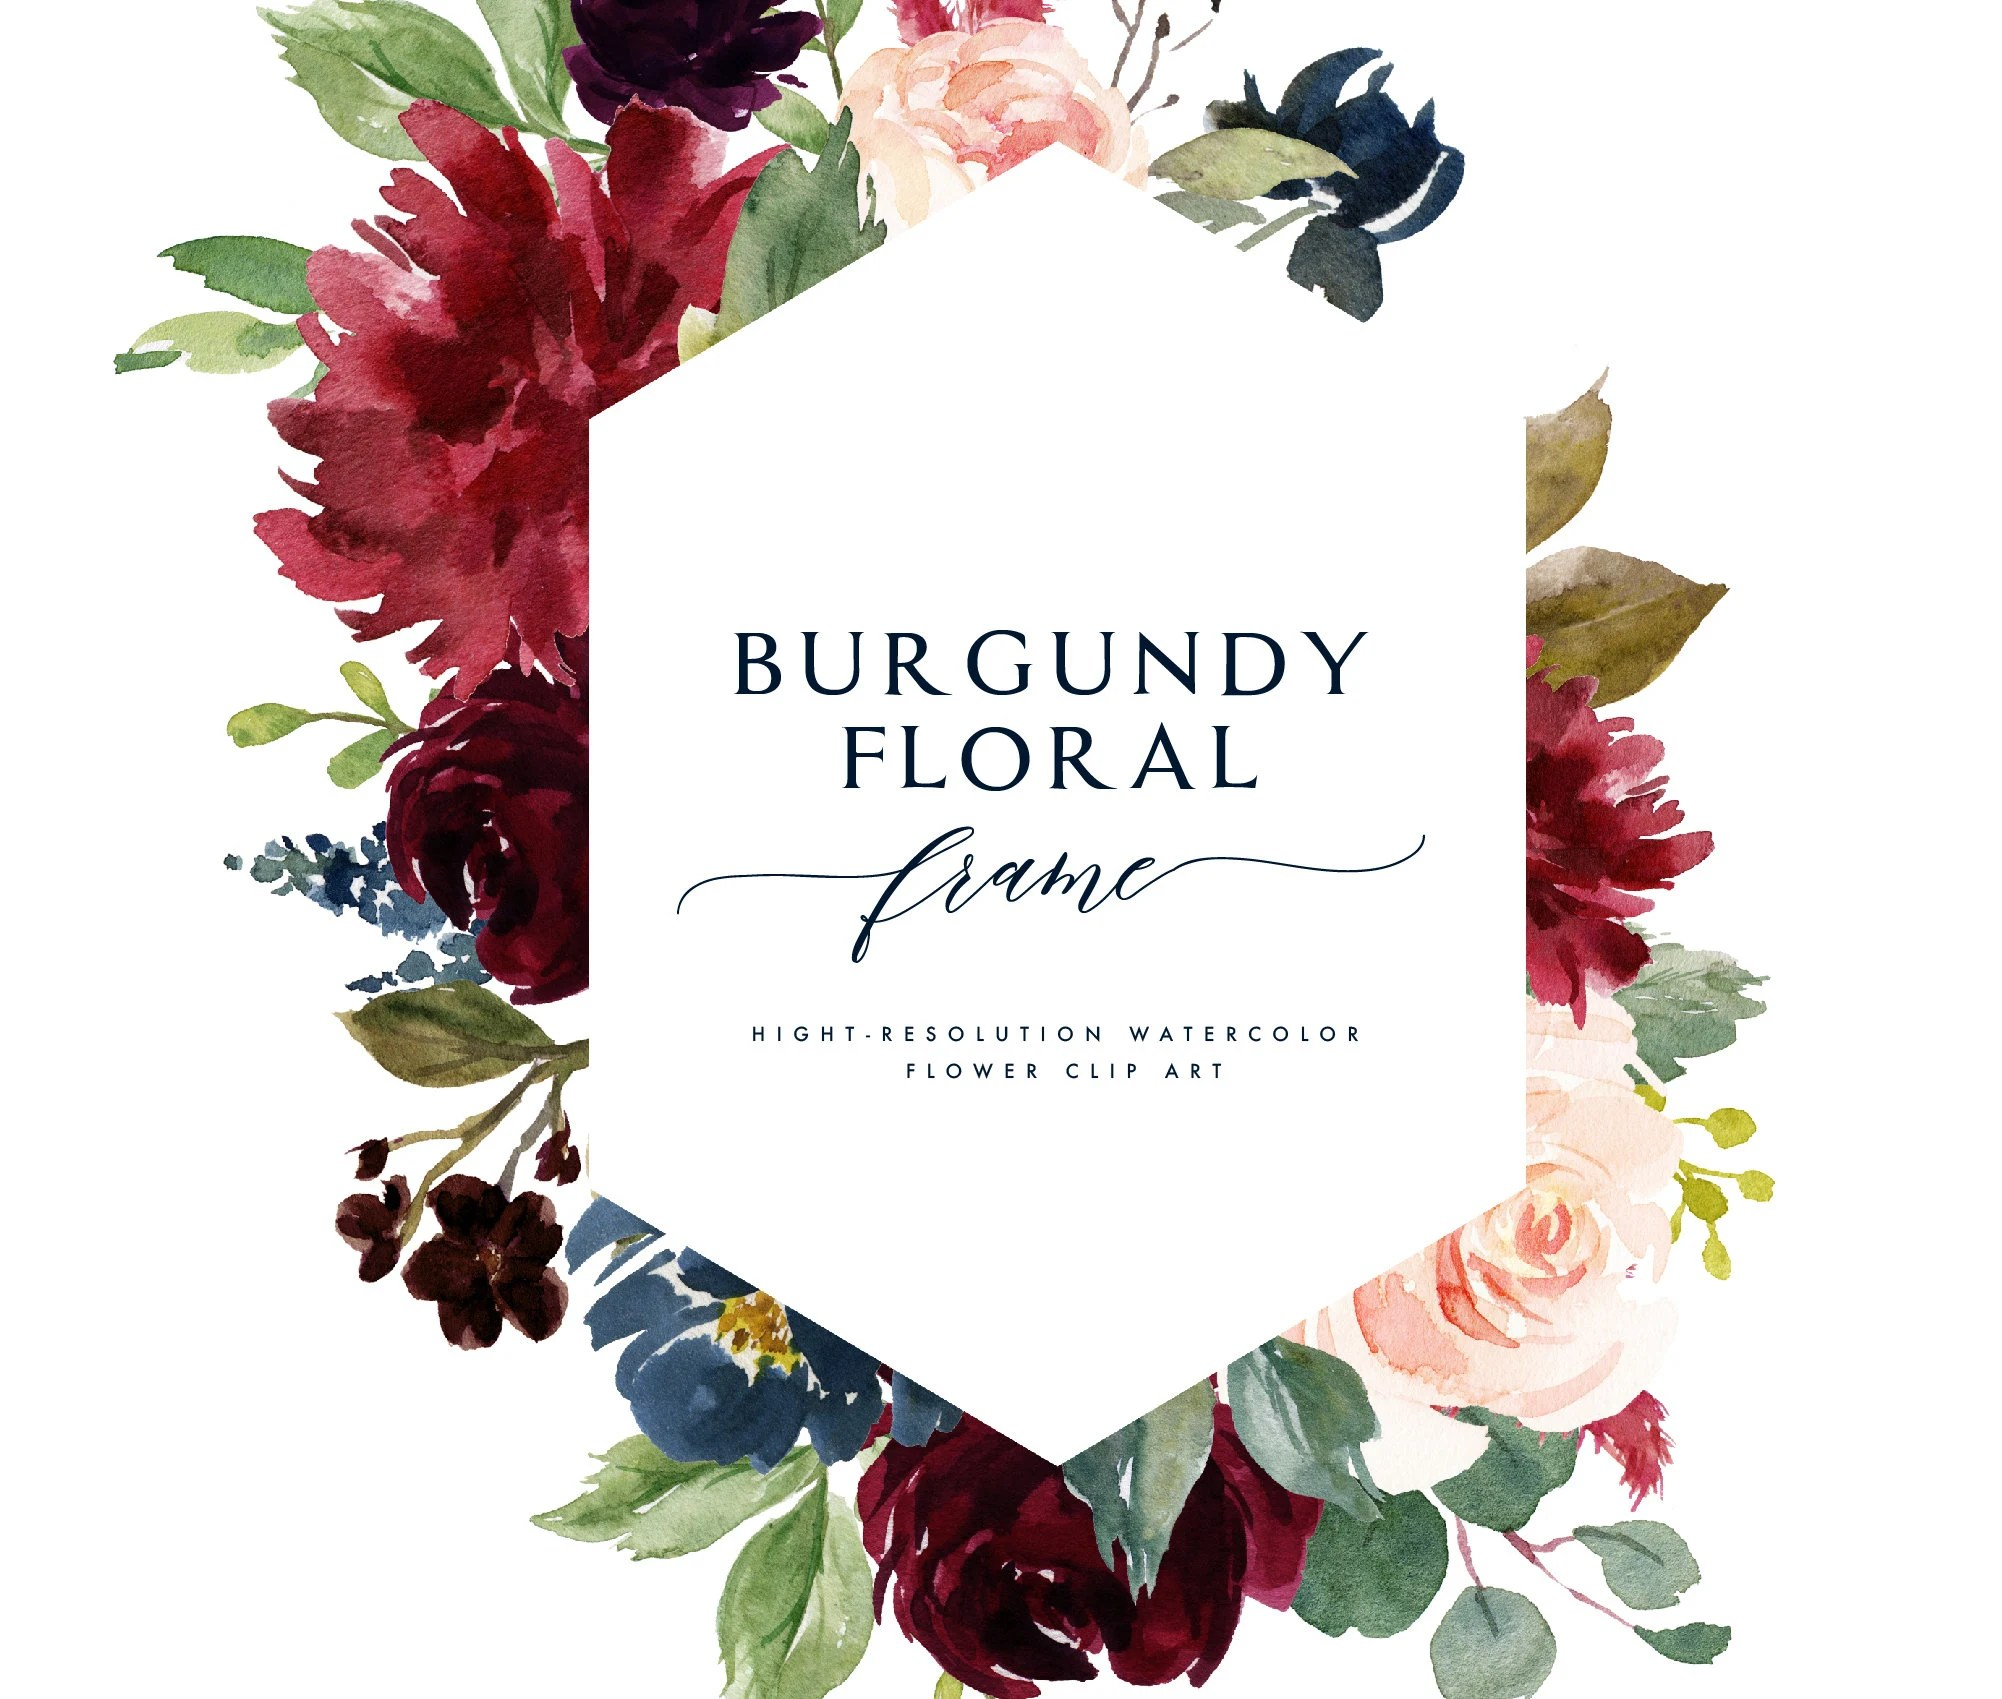 Aquarell Blumen Rahmen ClipartBurgund floralindividuelle